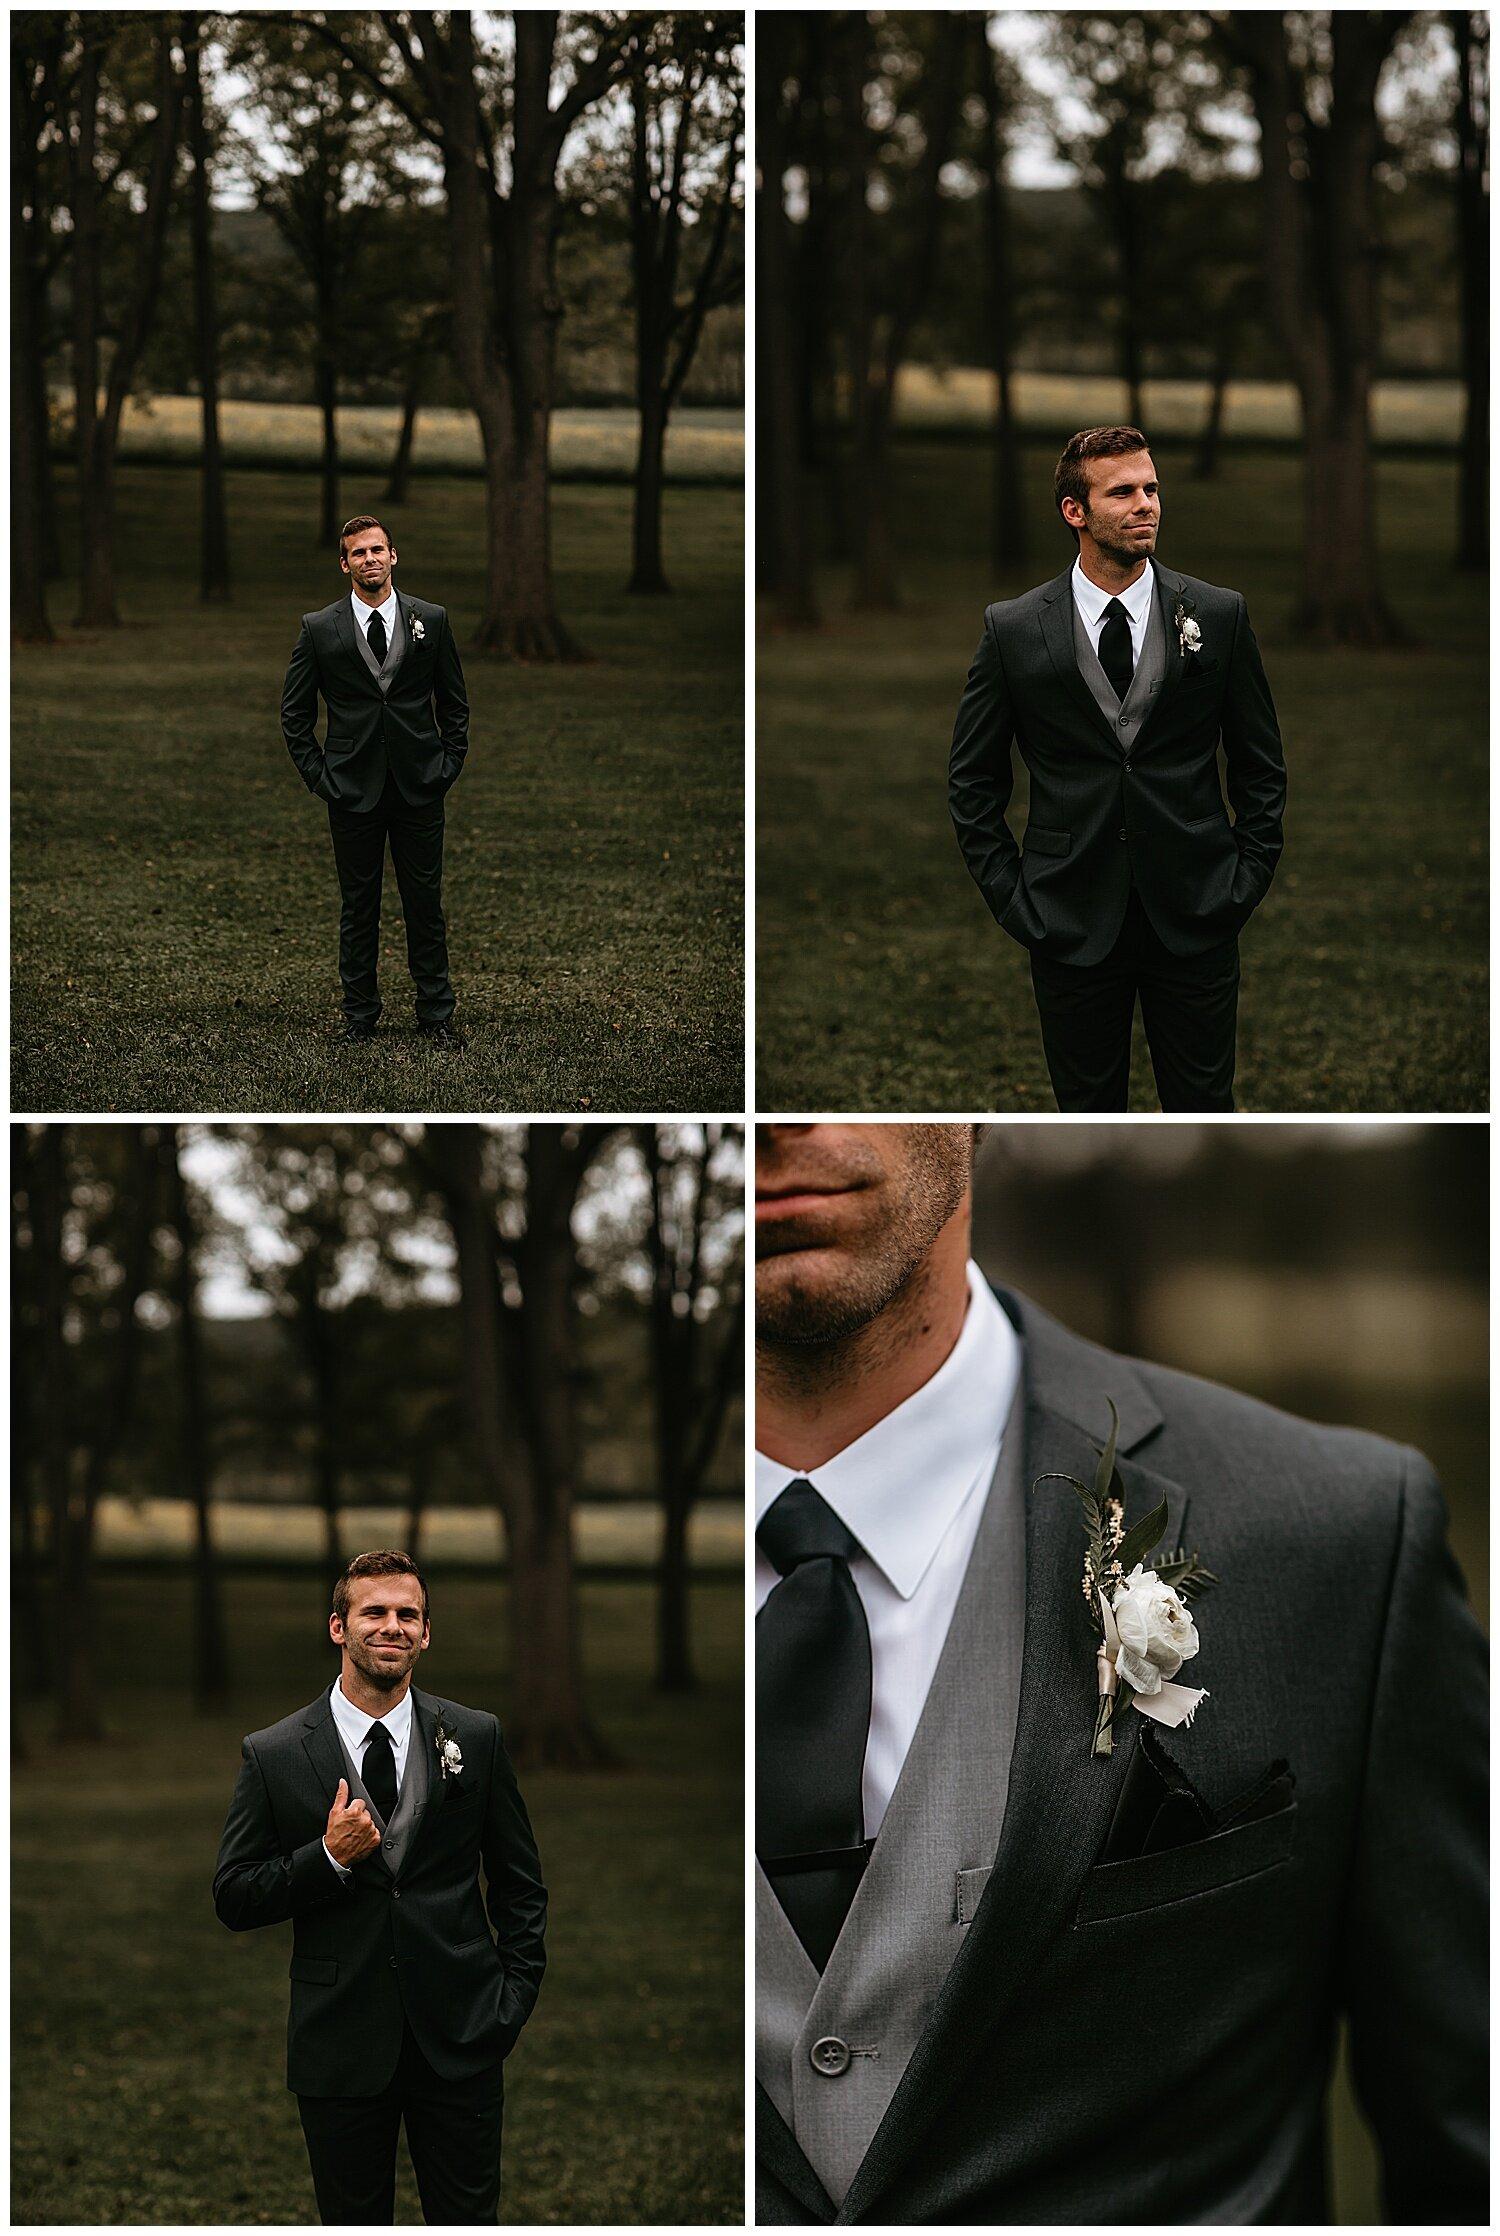 NEPA-Lewisburg-Wedding-Photographer-at-the-Rusty-Rail_0004.jpg